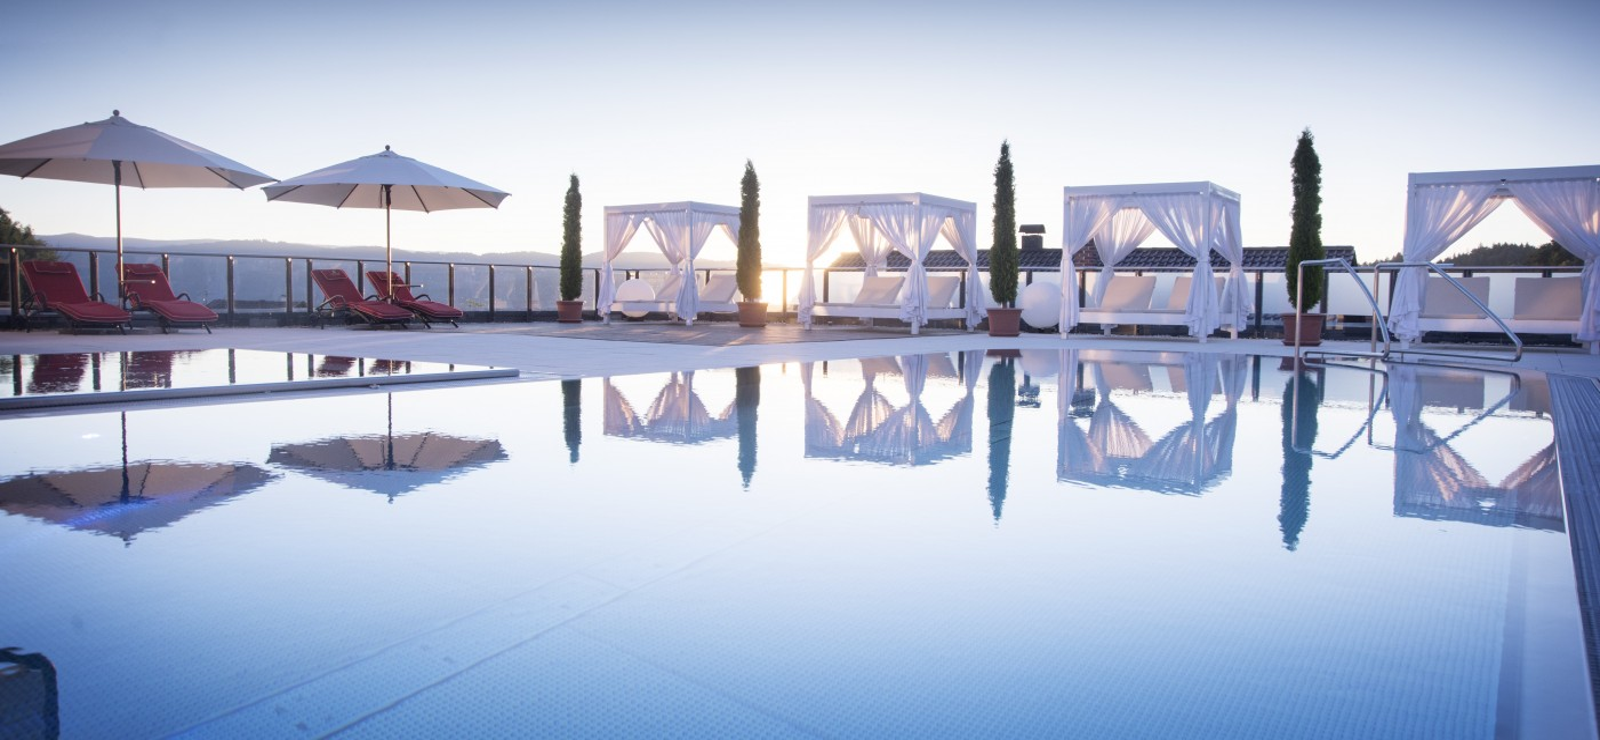 Relais & Châteaux Landromantik Hotel Oswald Bilder | Bild 1